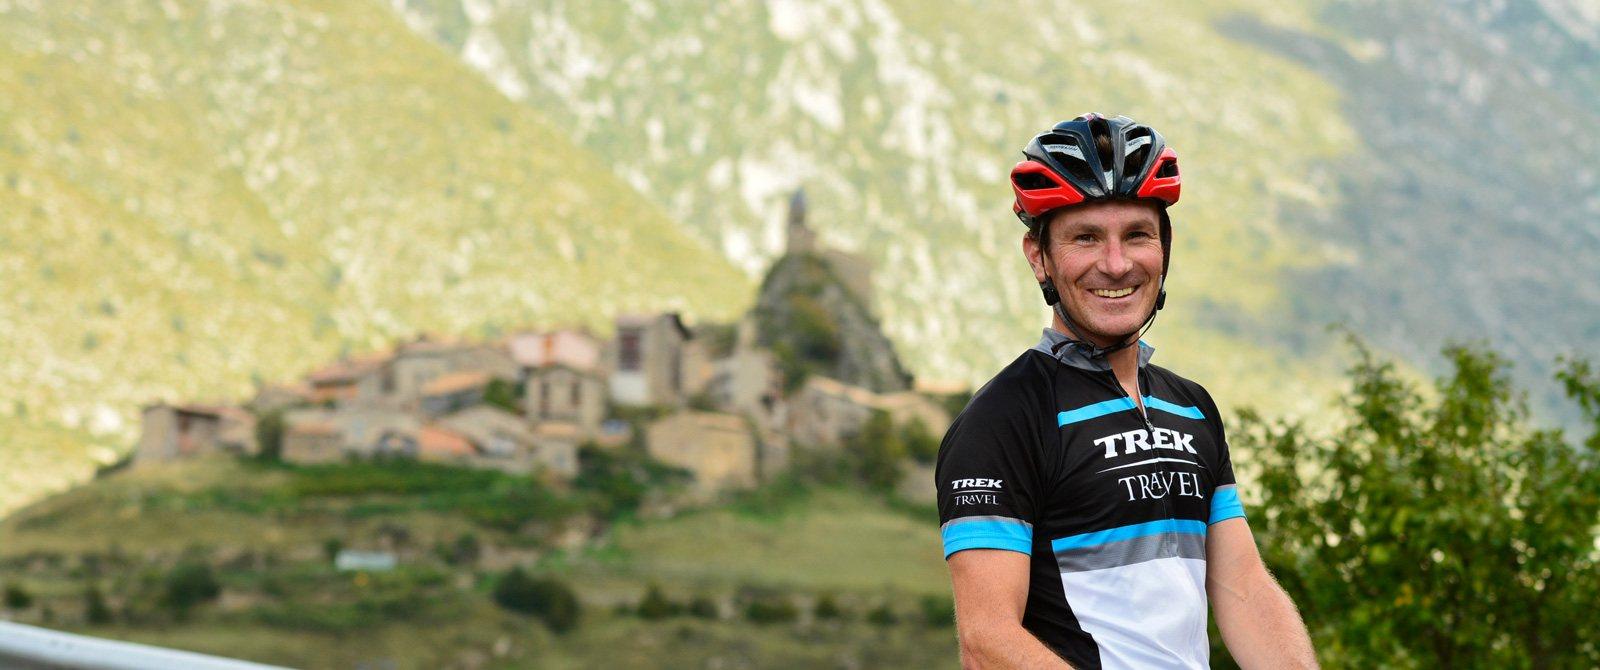 Trek Travel Cycling Guide Zack Jones